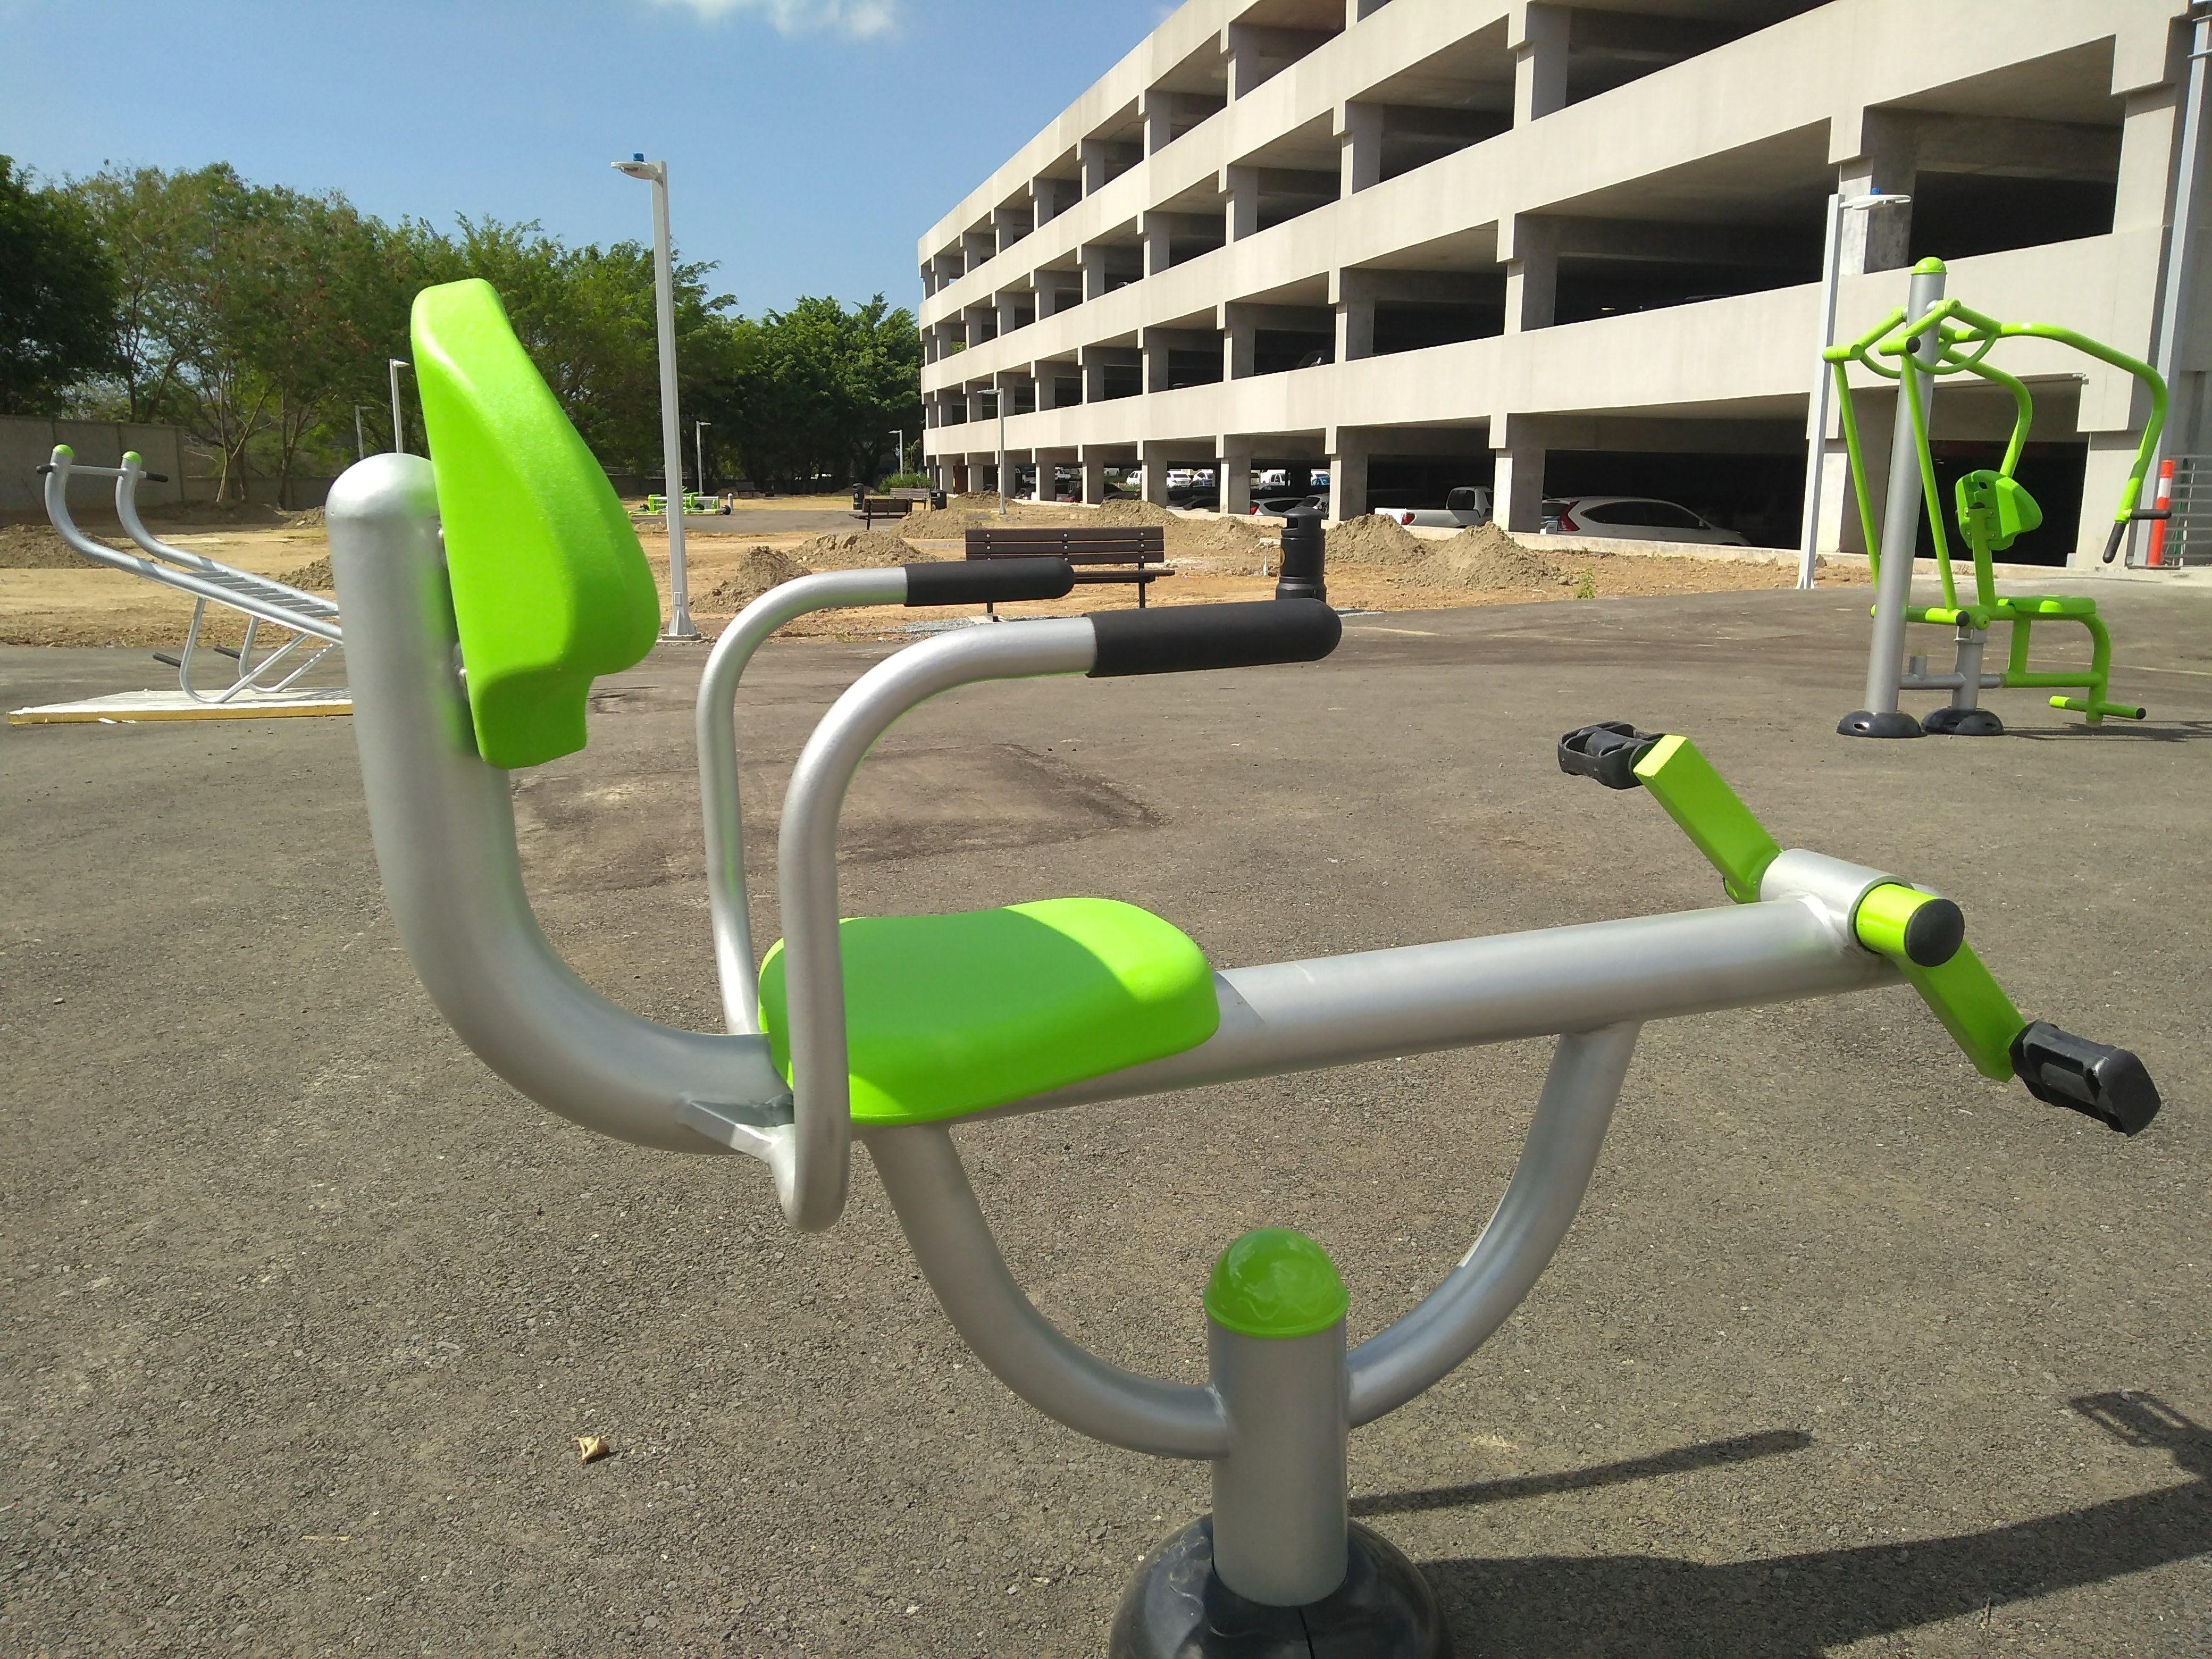 parques con gimnasio al aire libre madrid